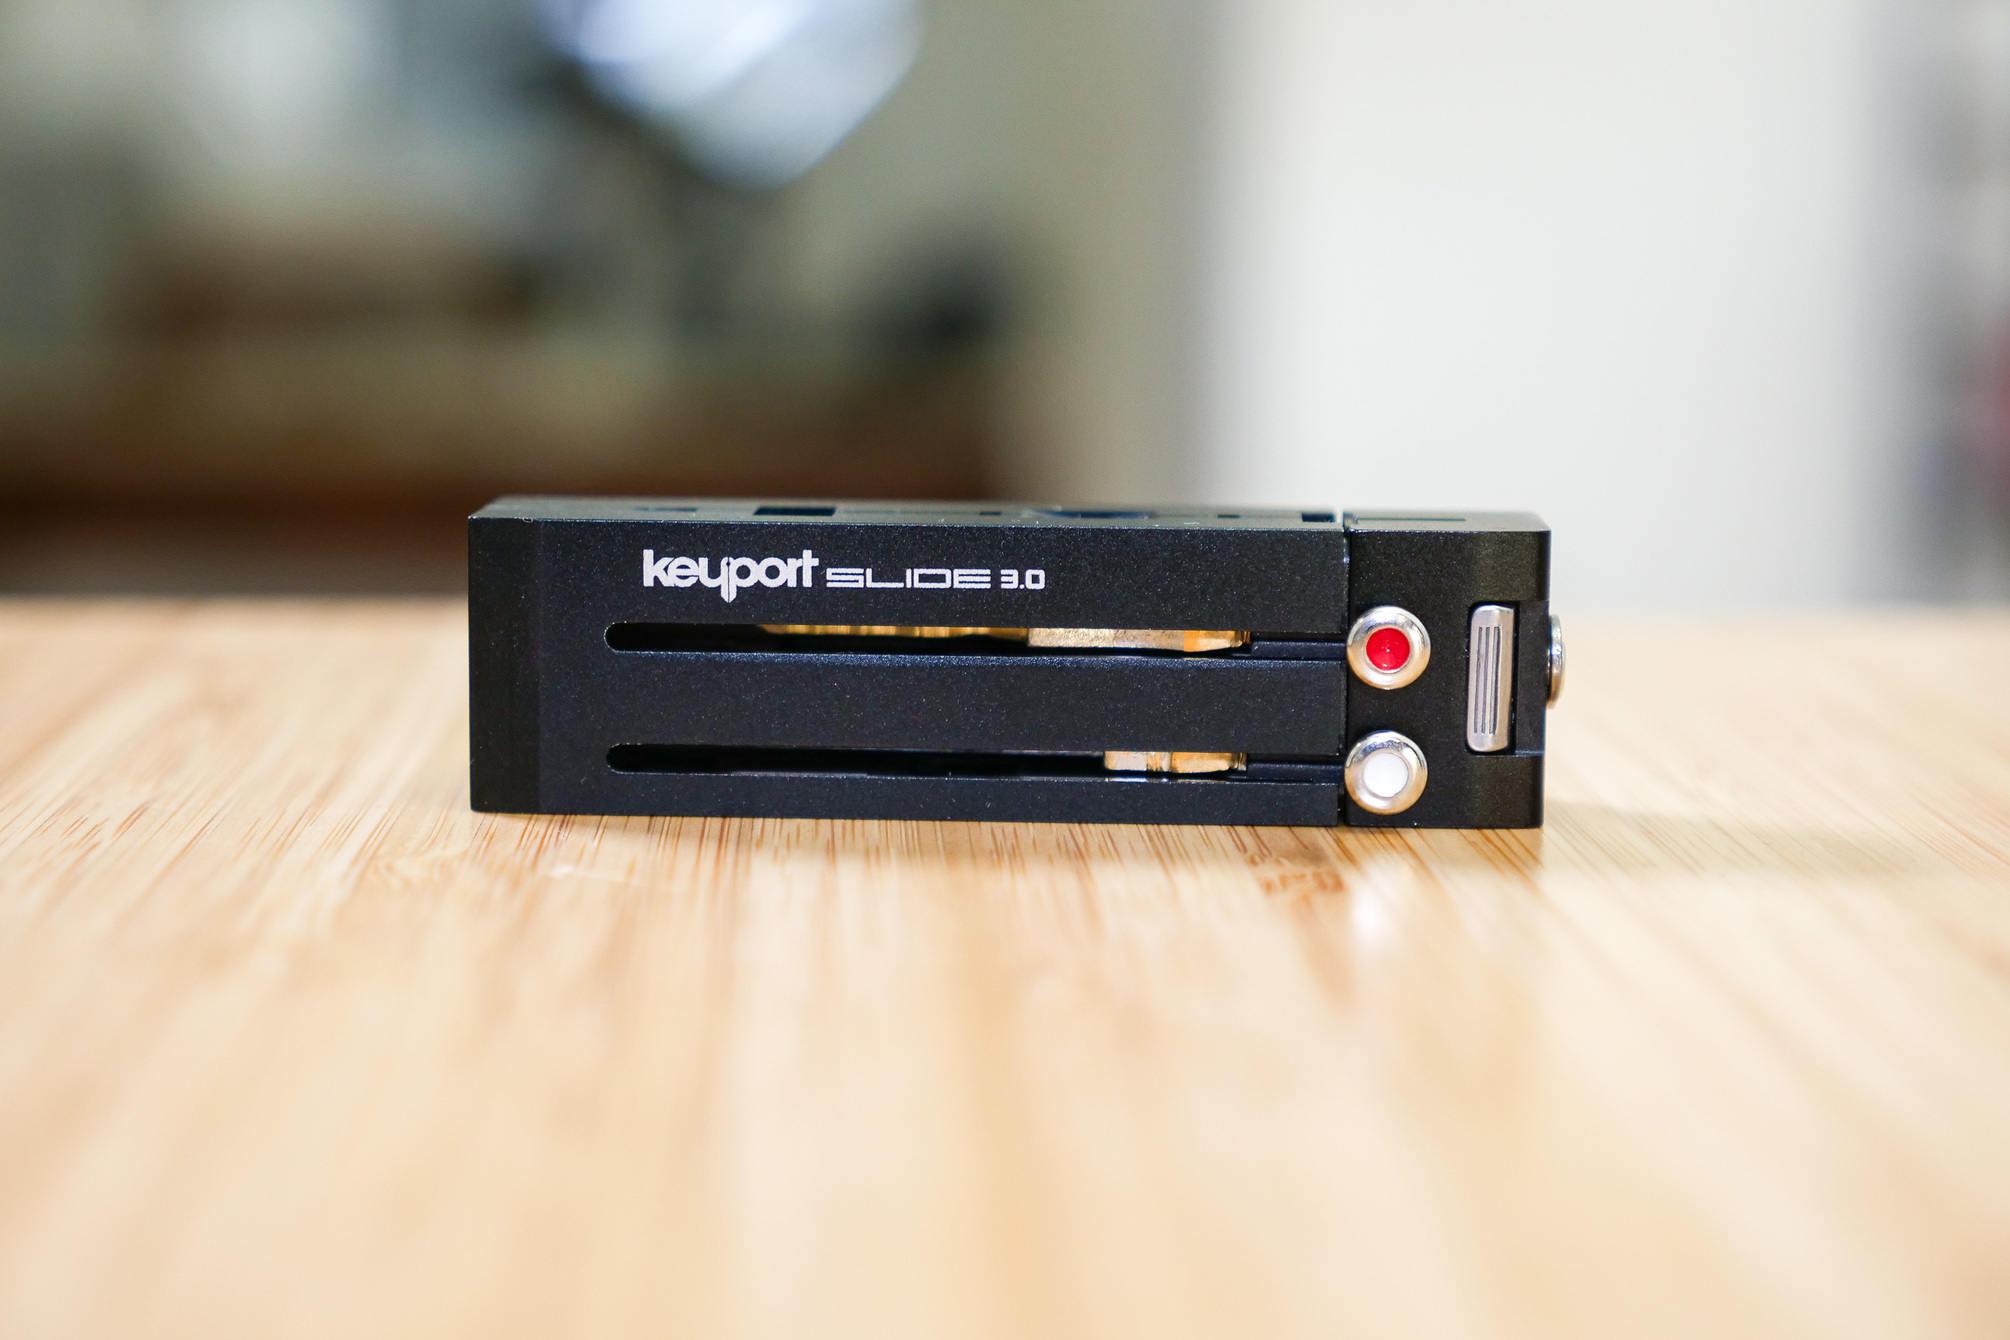 Keyport Slide 3.0